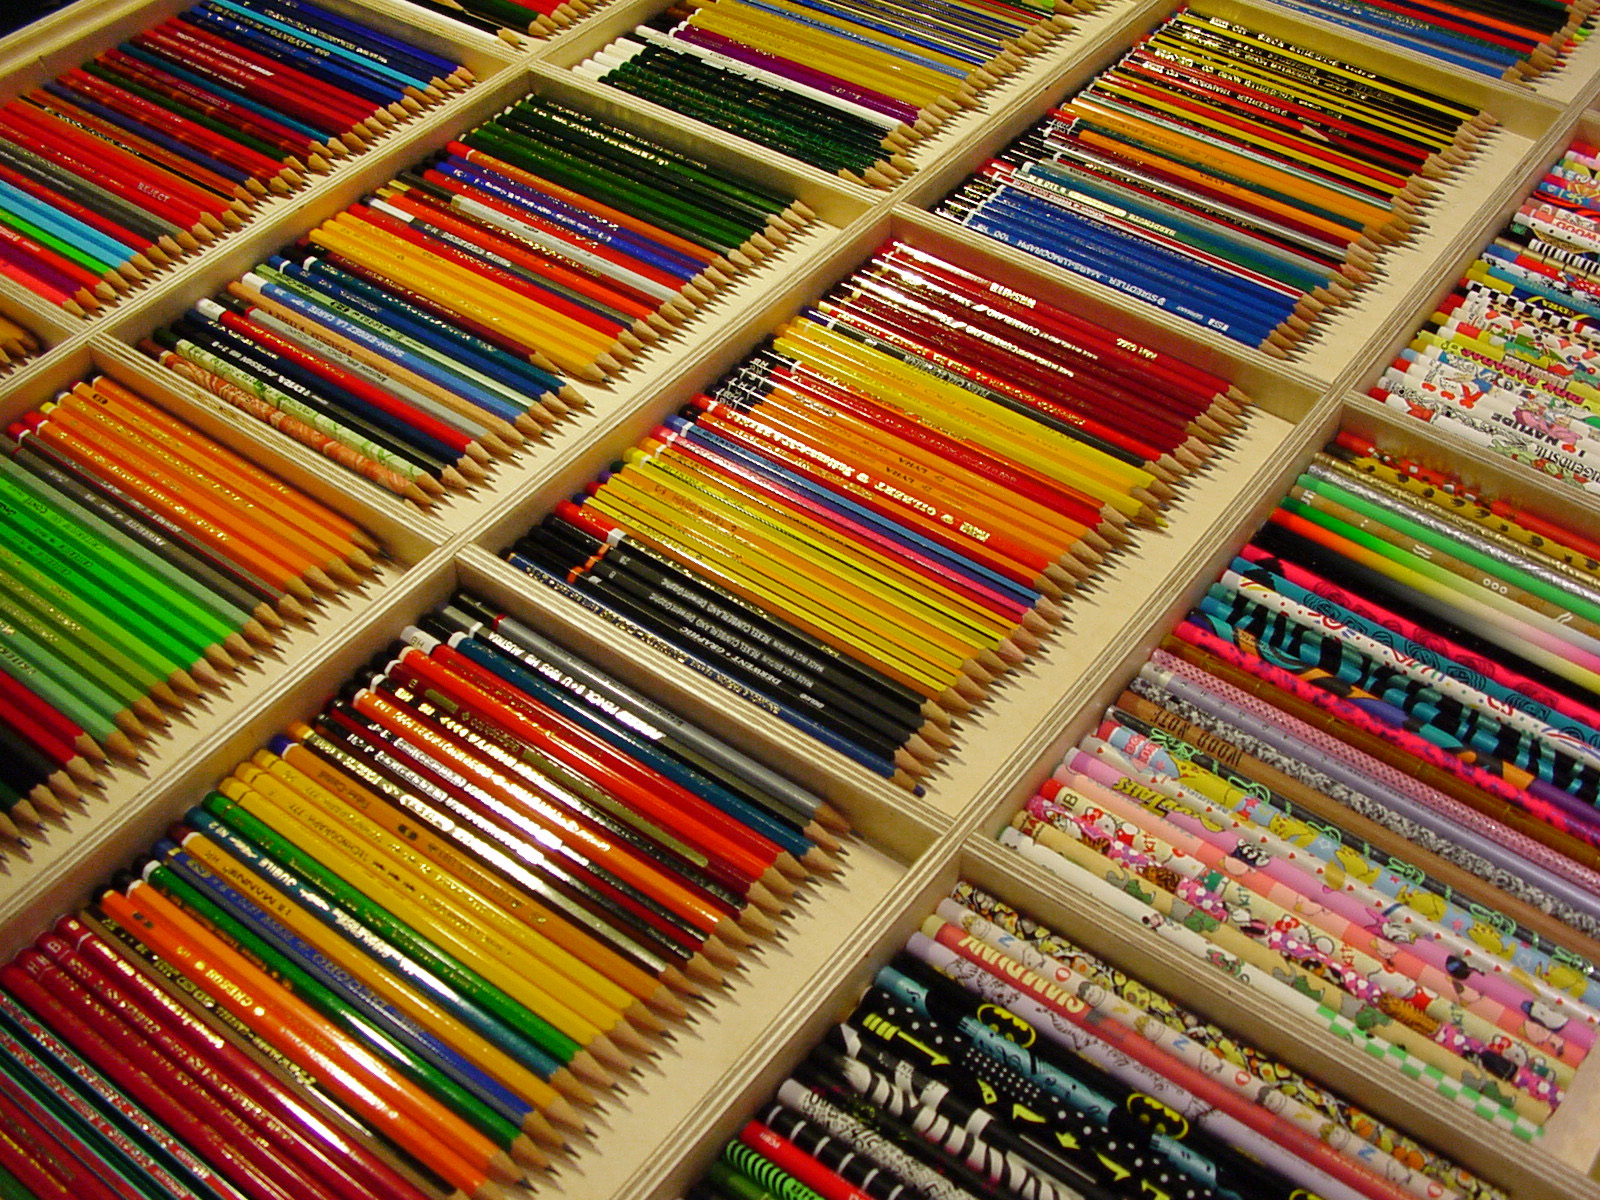 mdc-2001-crayons-01-1600